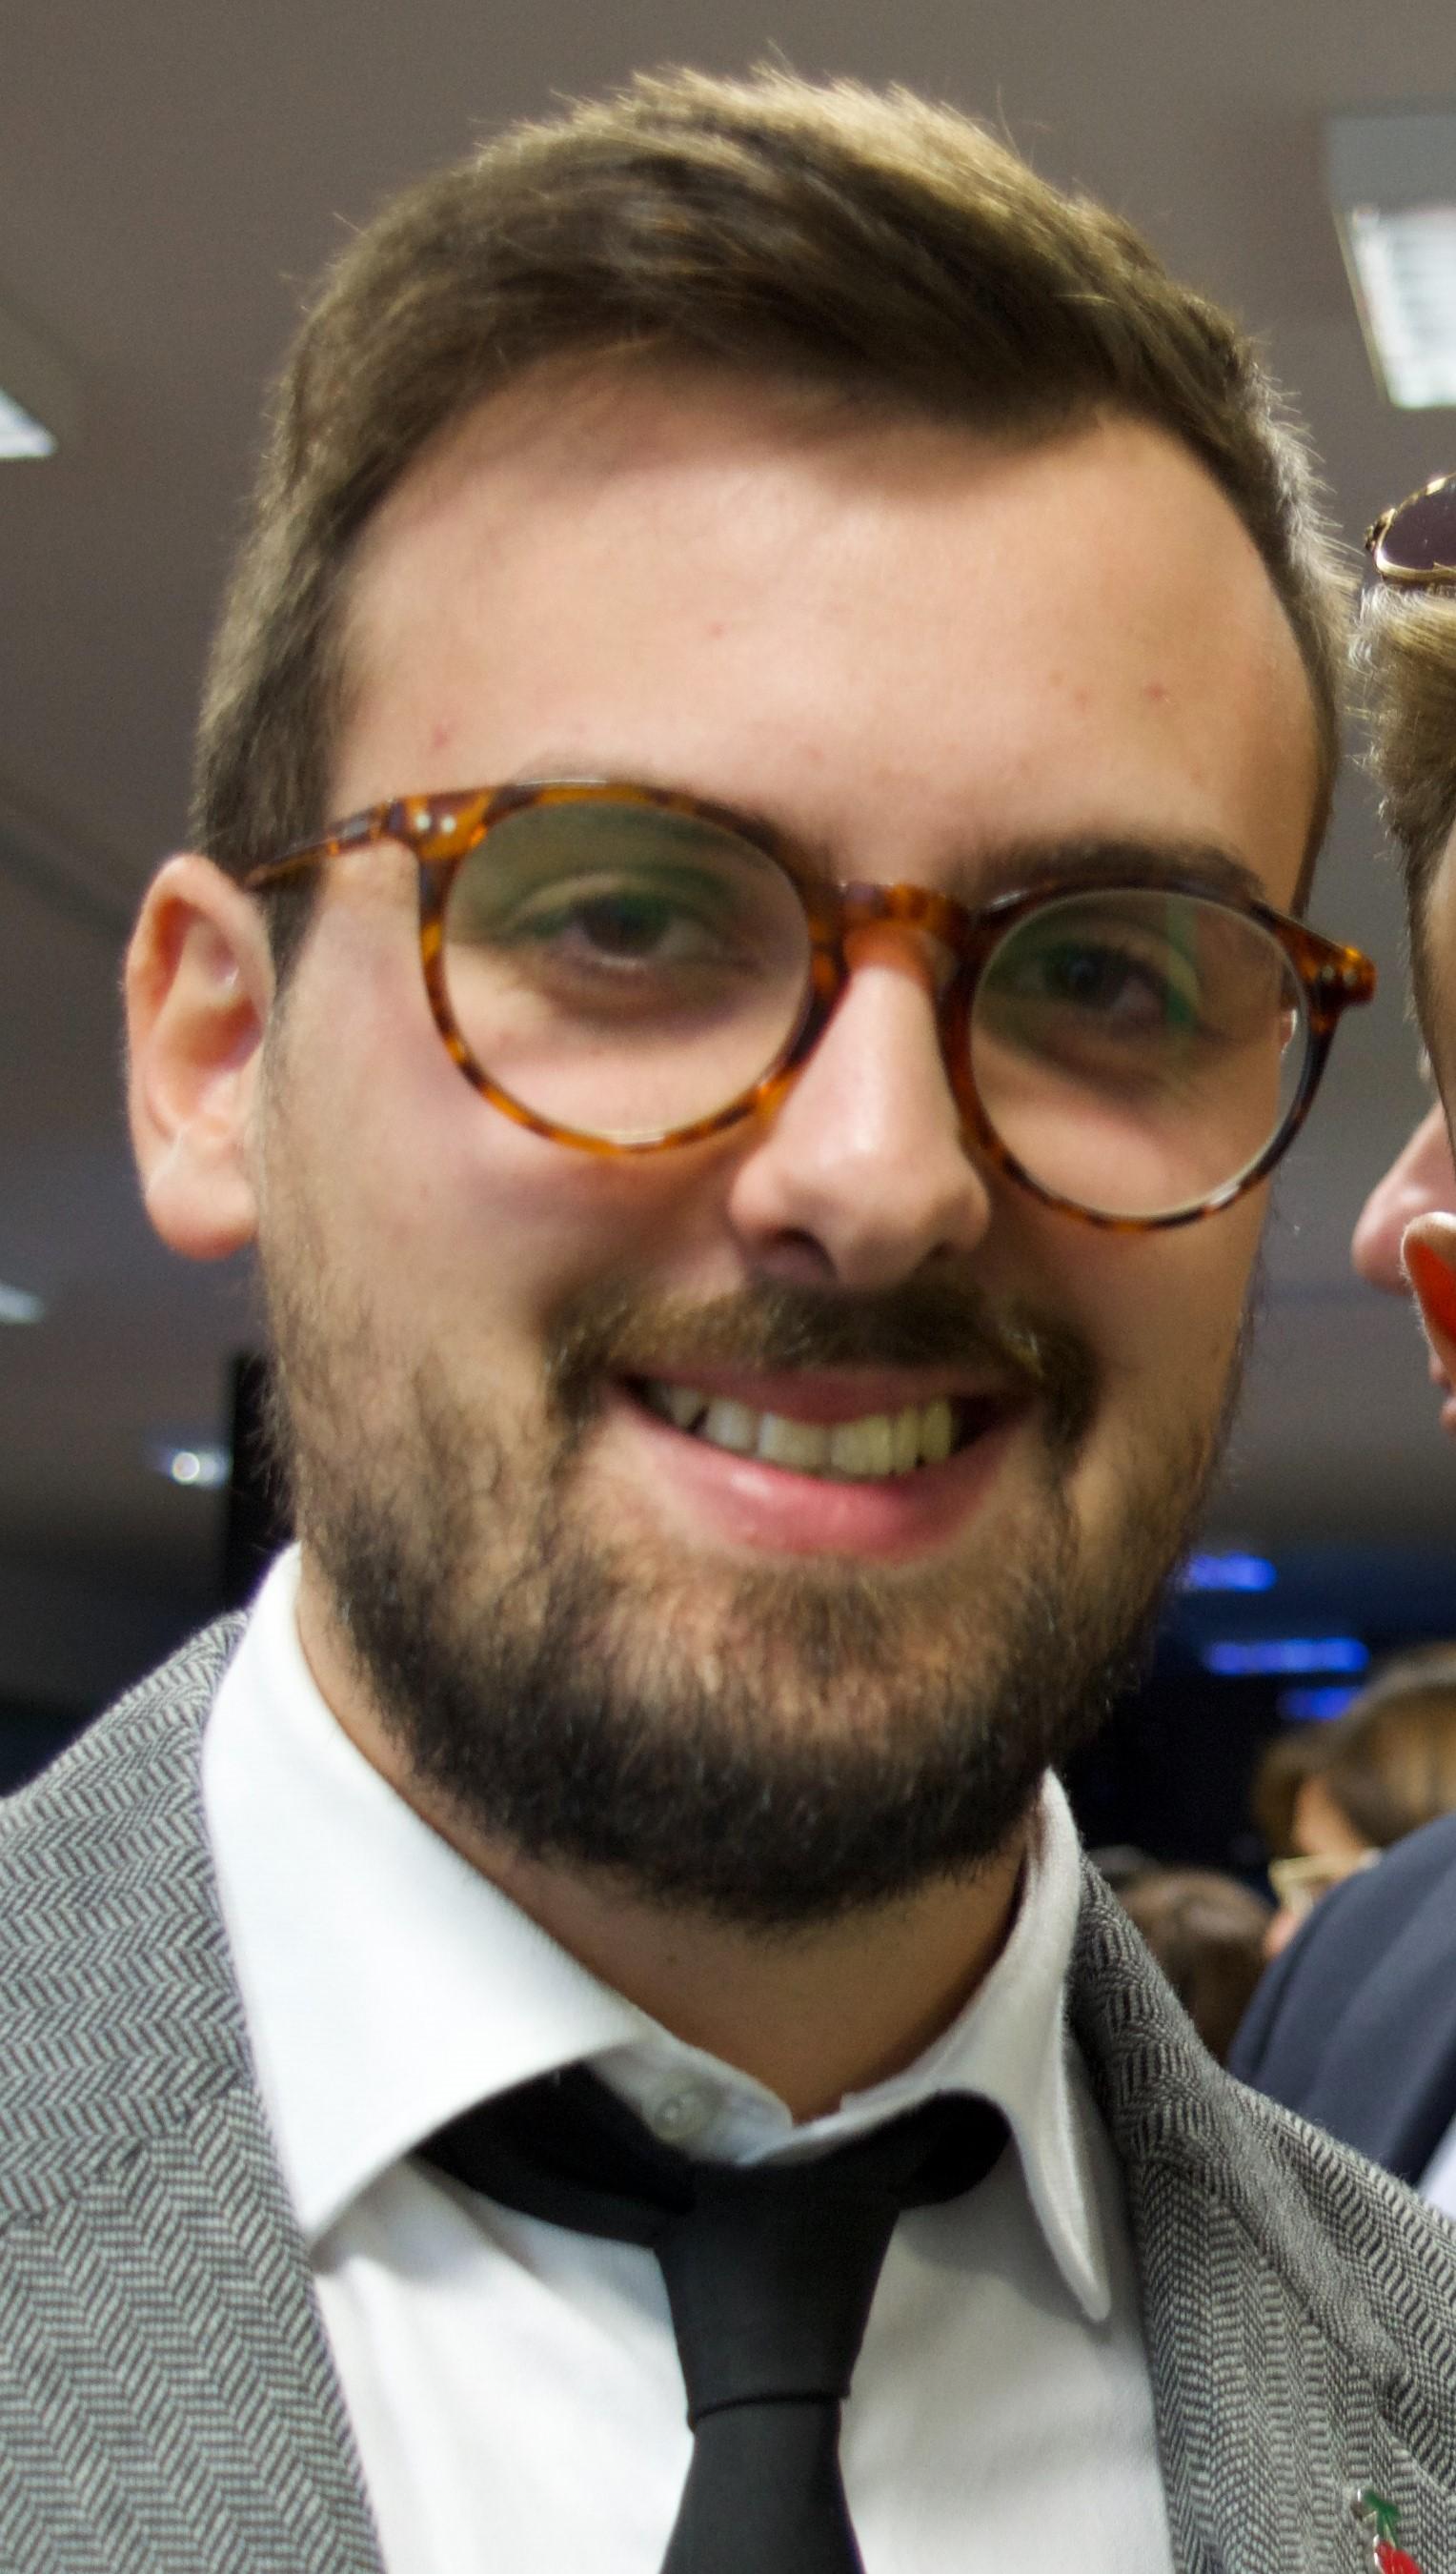 Giuseppe Ruffolo